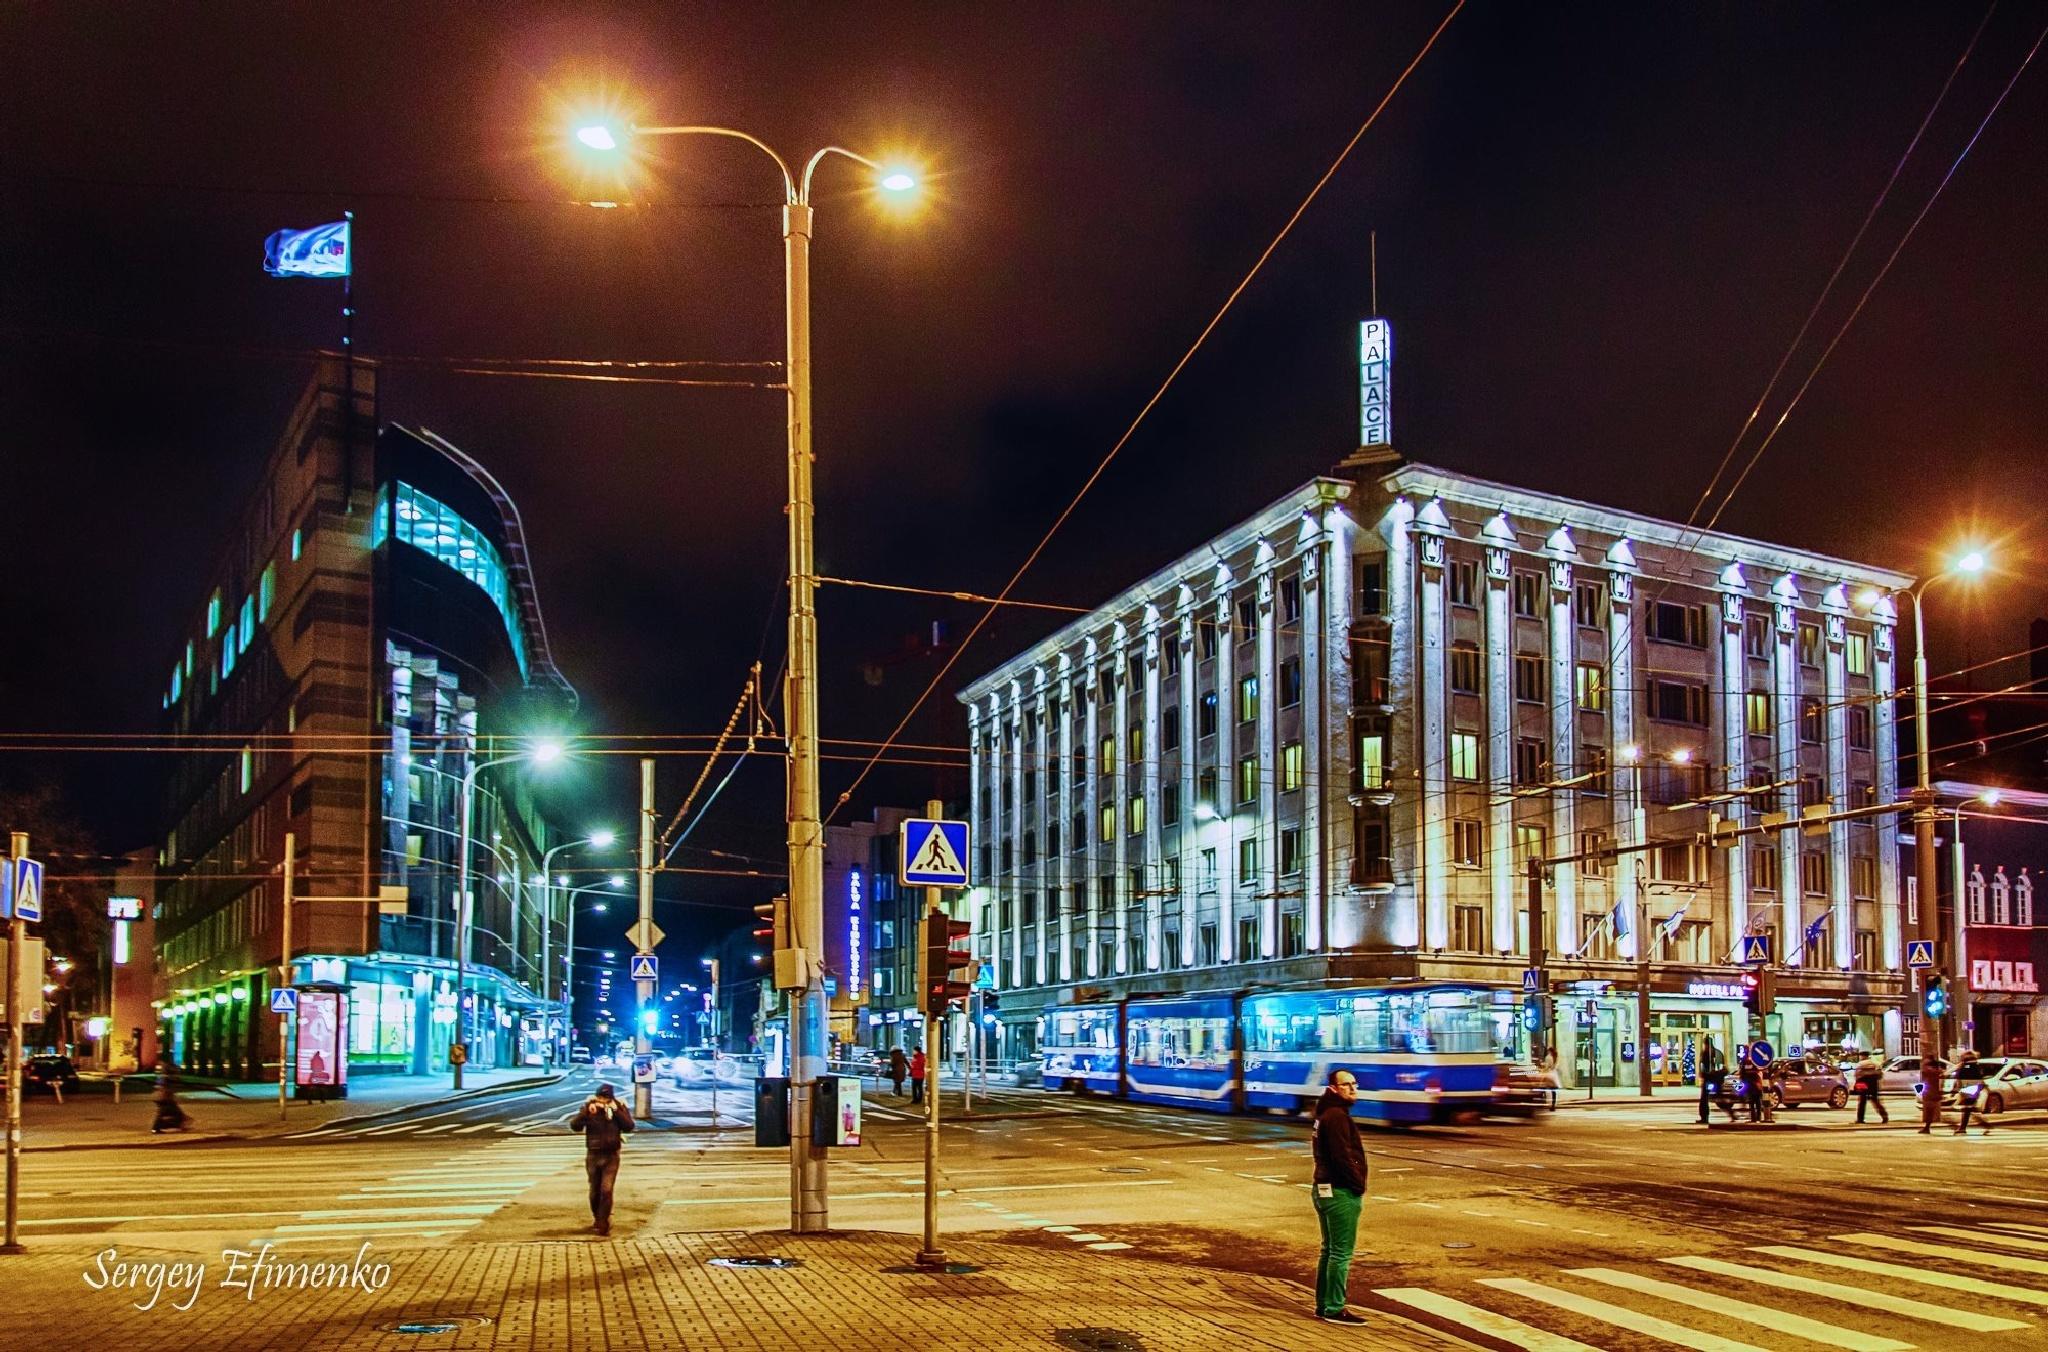 Tallinn at night by Sergey Efimenko